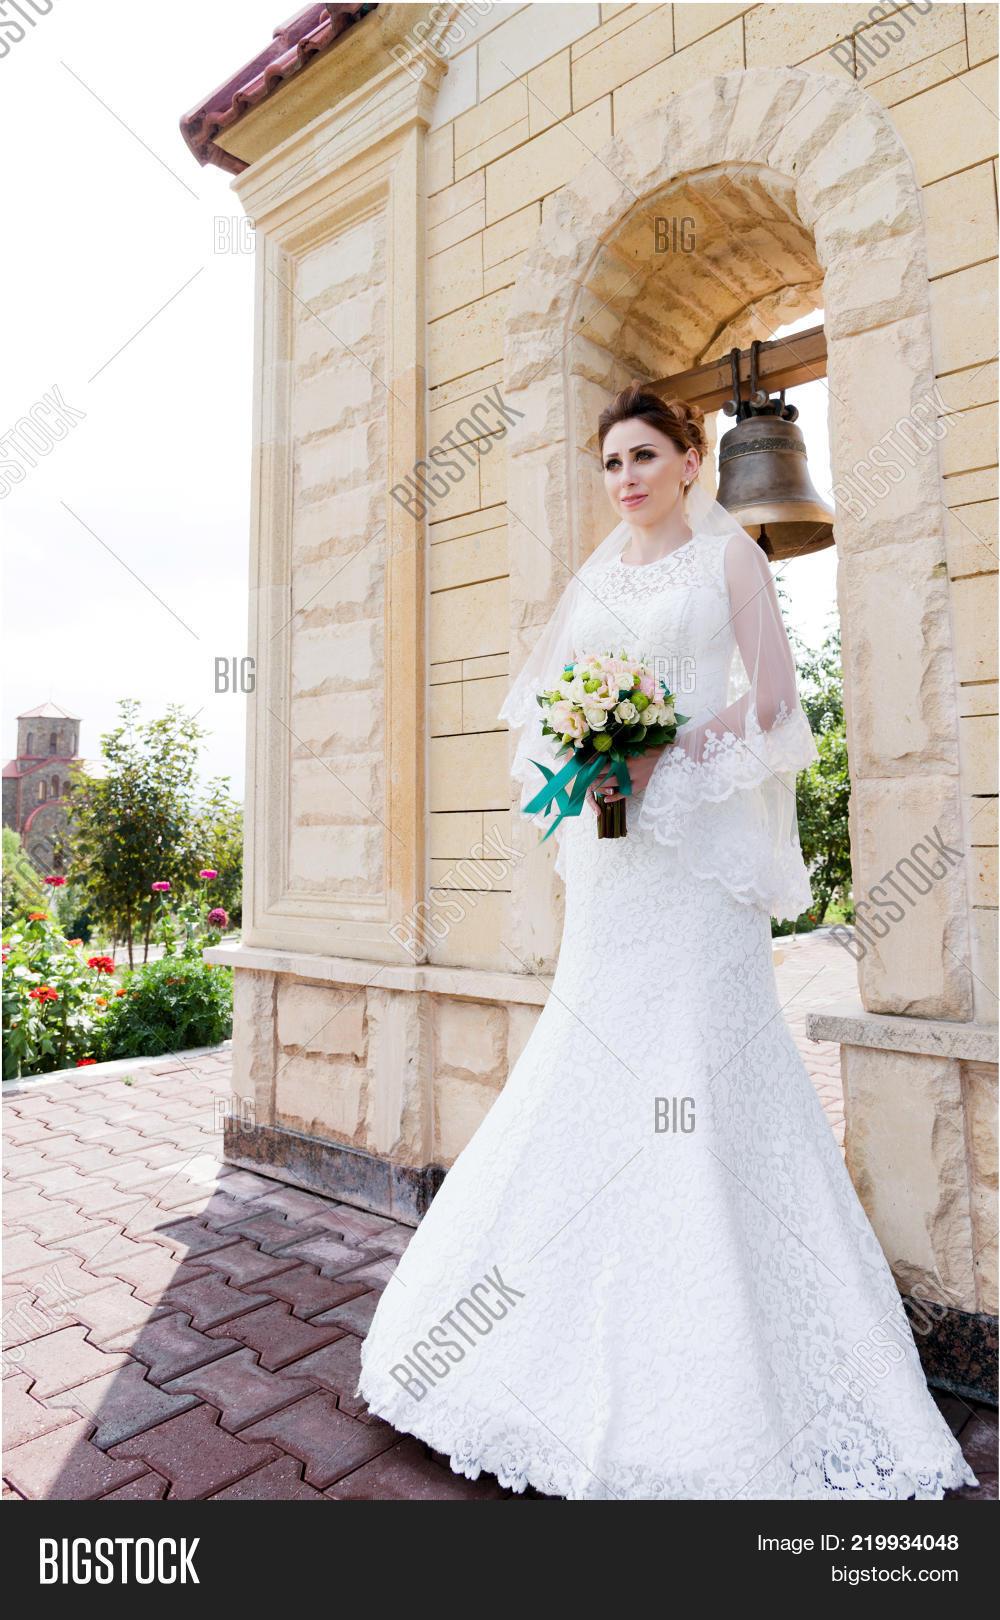 Beautiful Bride Wedding Dress Image & Photo | Bigstock